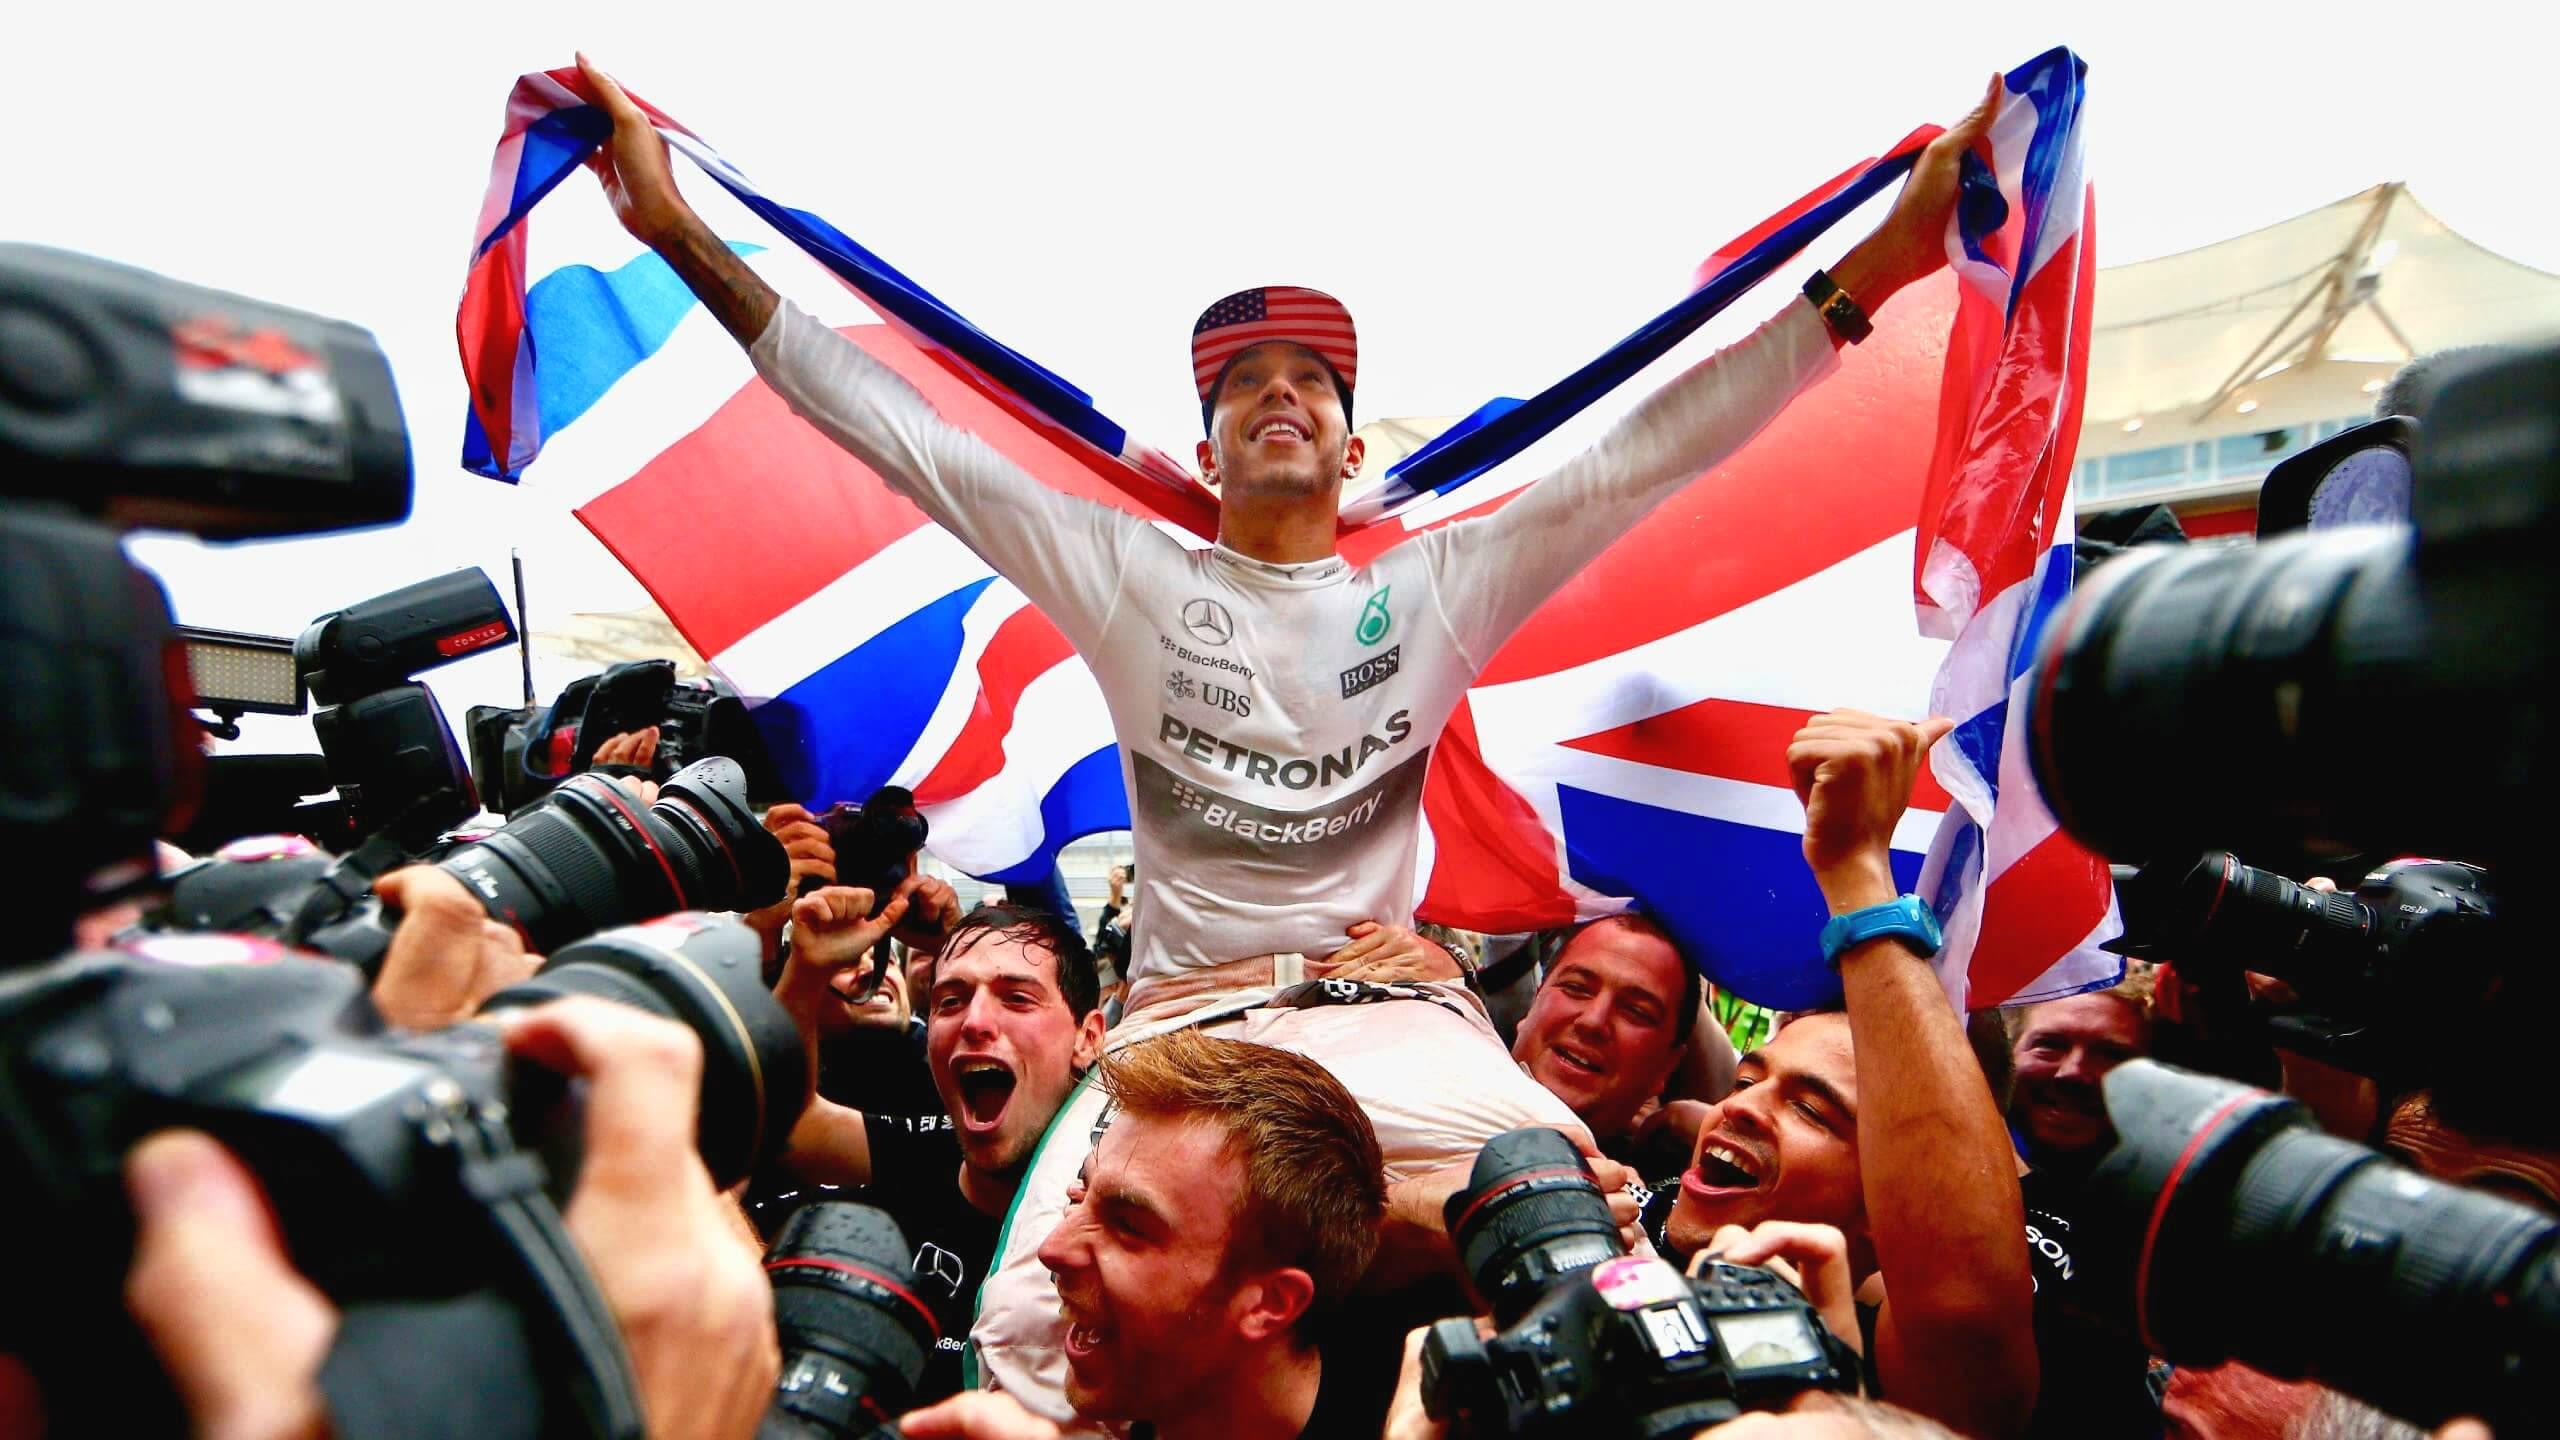 Lewis Hamilton celebrates with a Union Jack flag